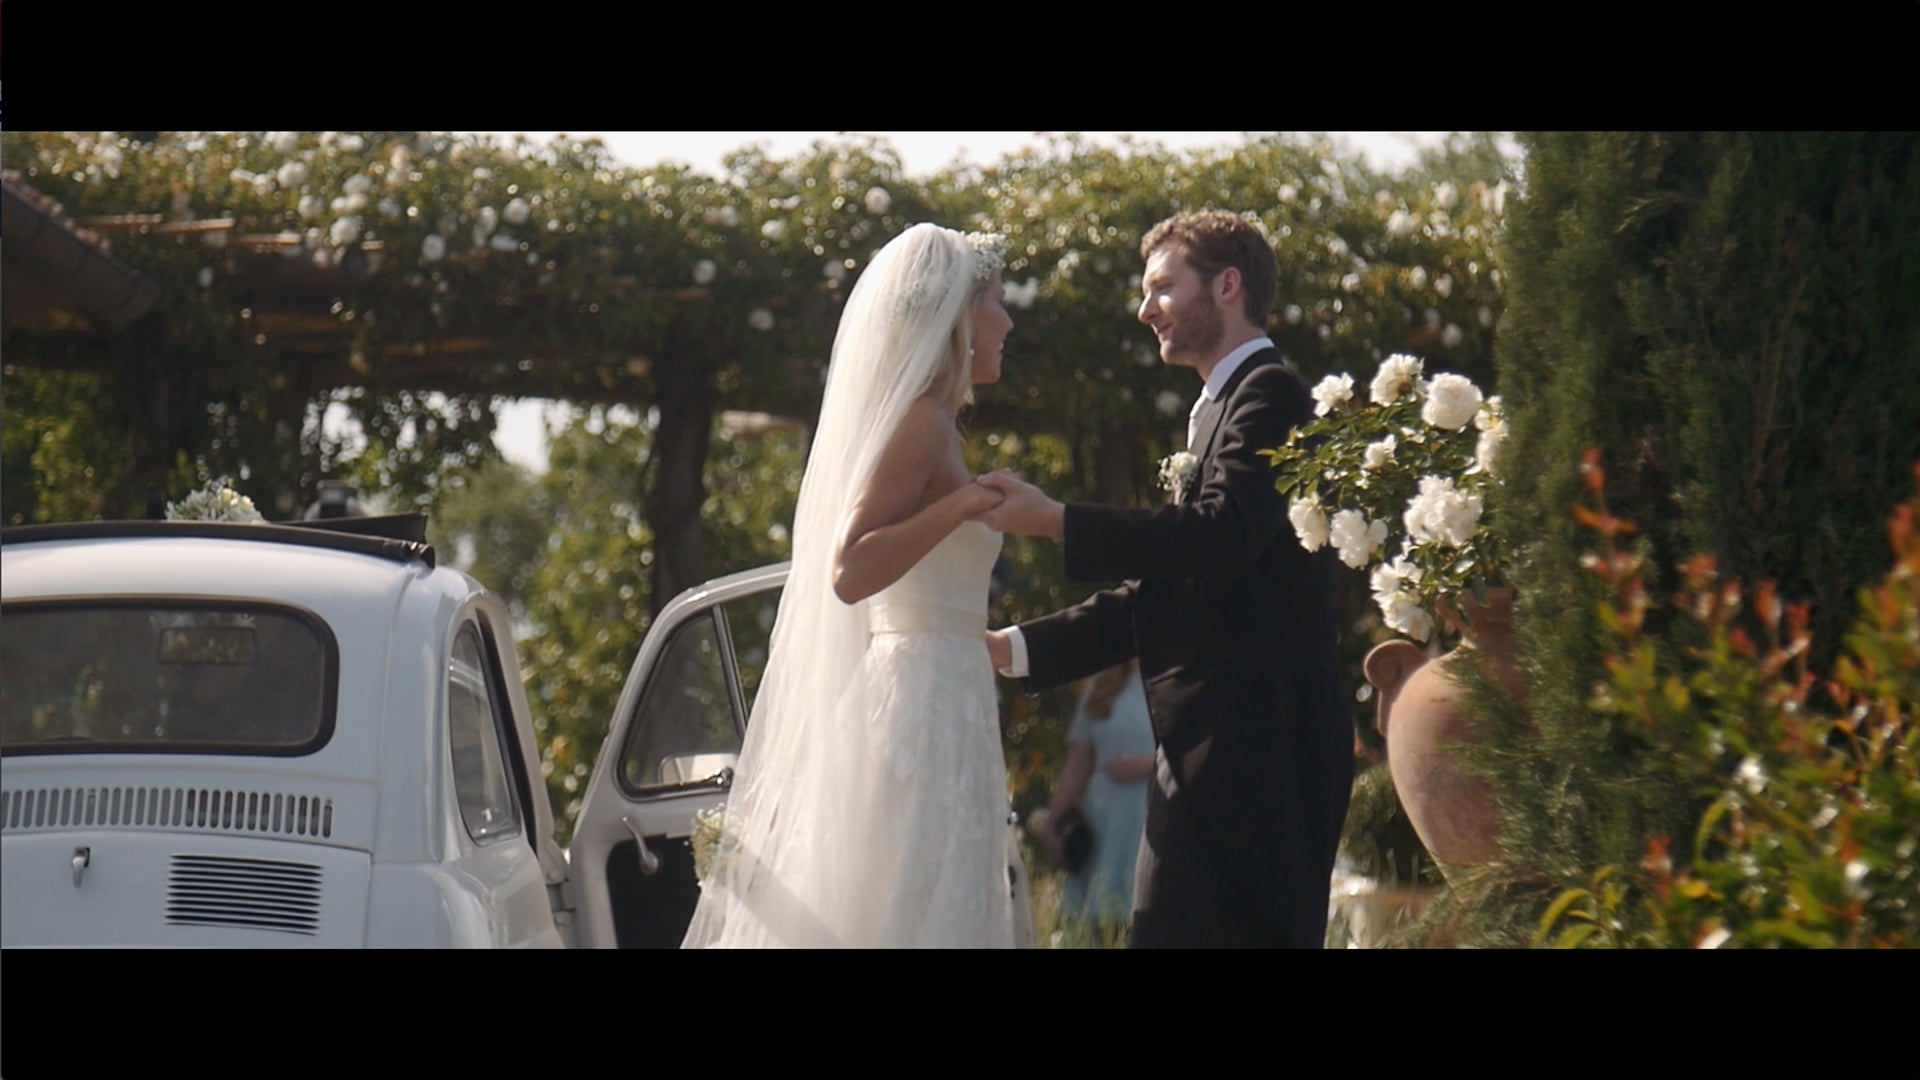 Oliver & Fiona - Cinema Wedding Film